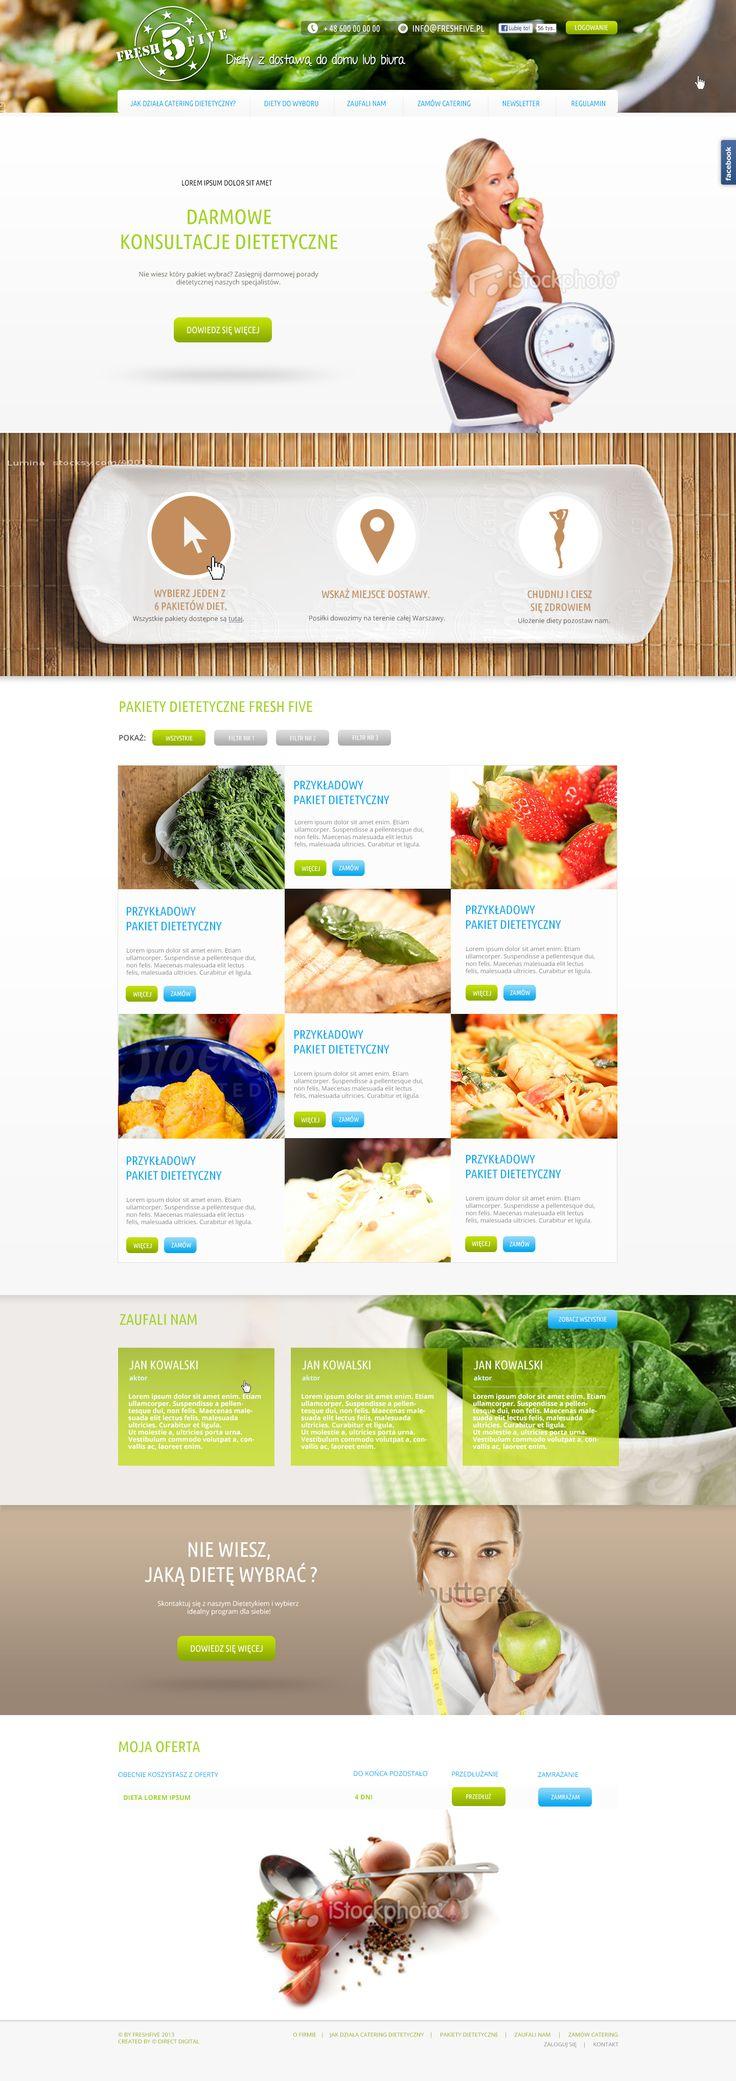 Fresh-Five website design.